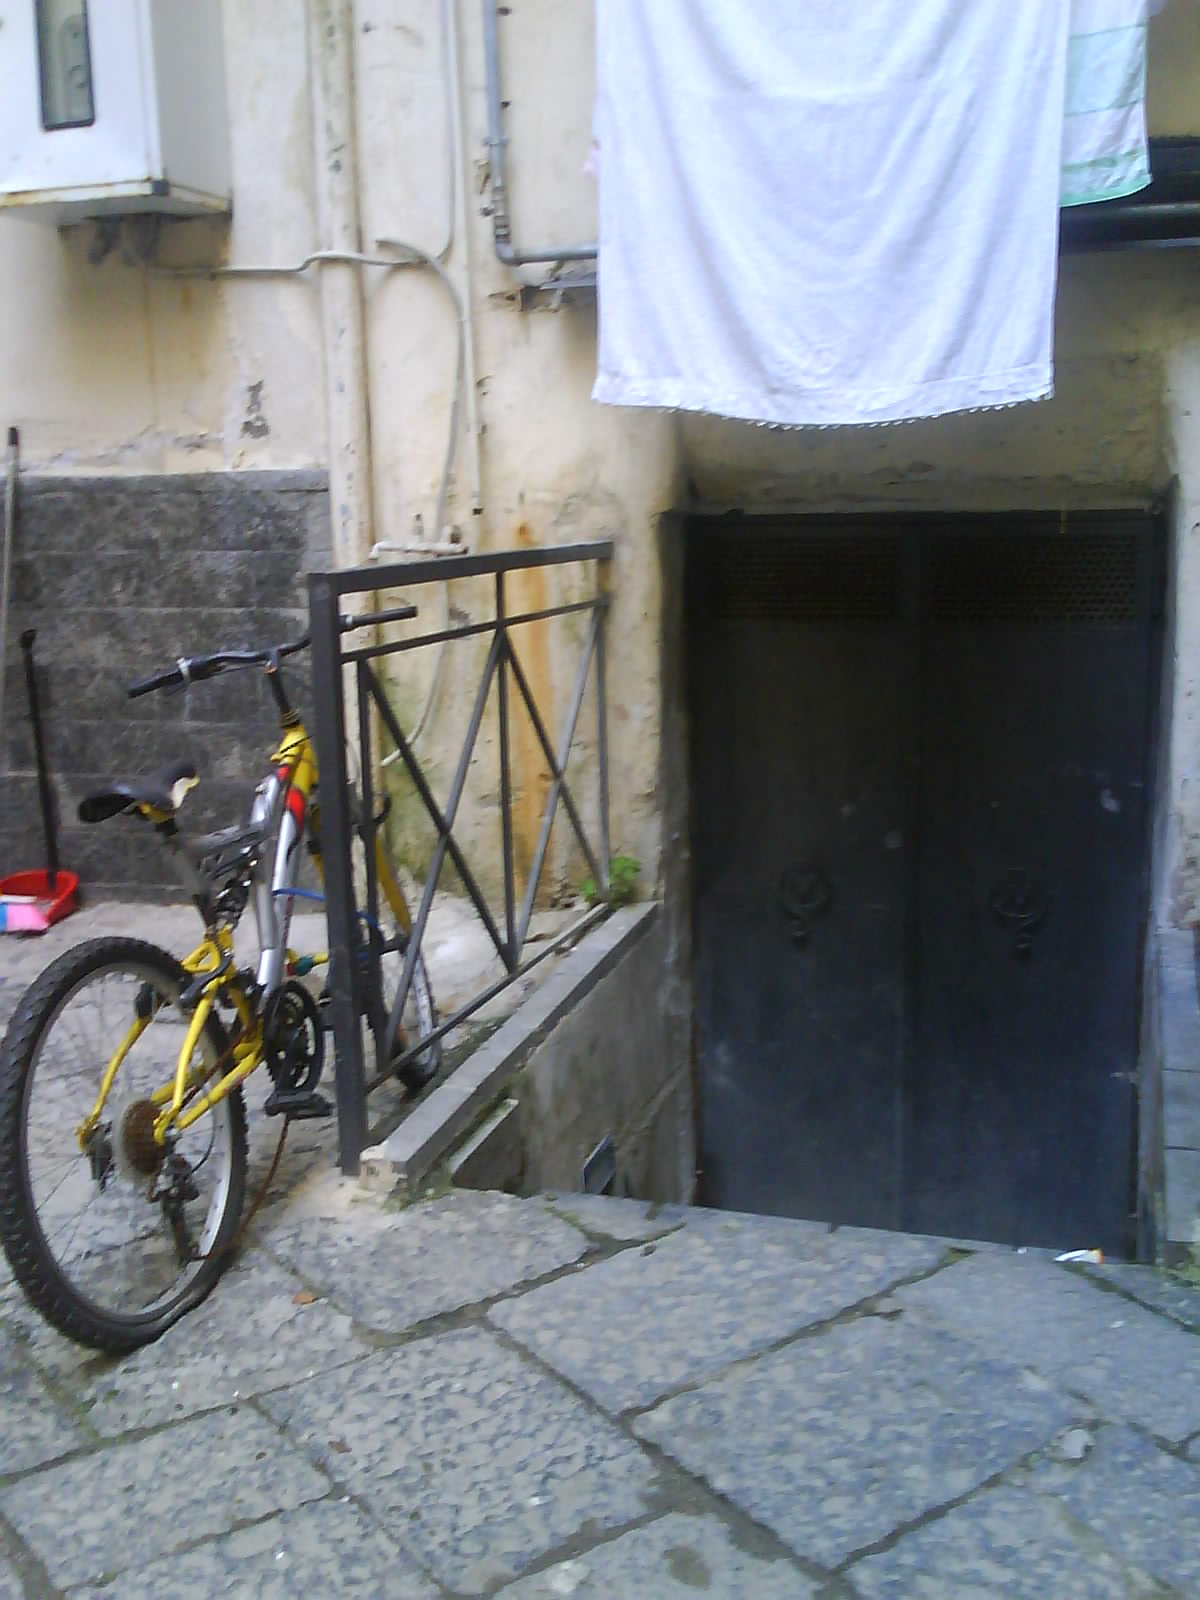 sotterranea b1